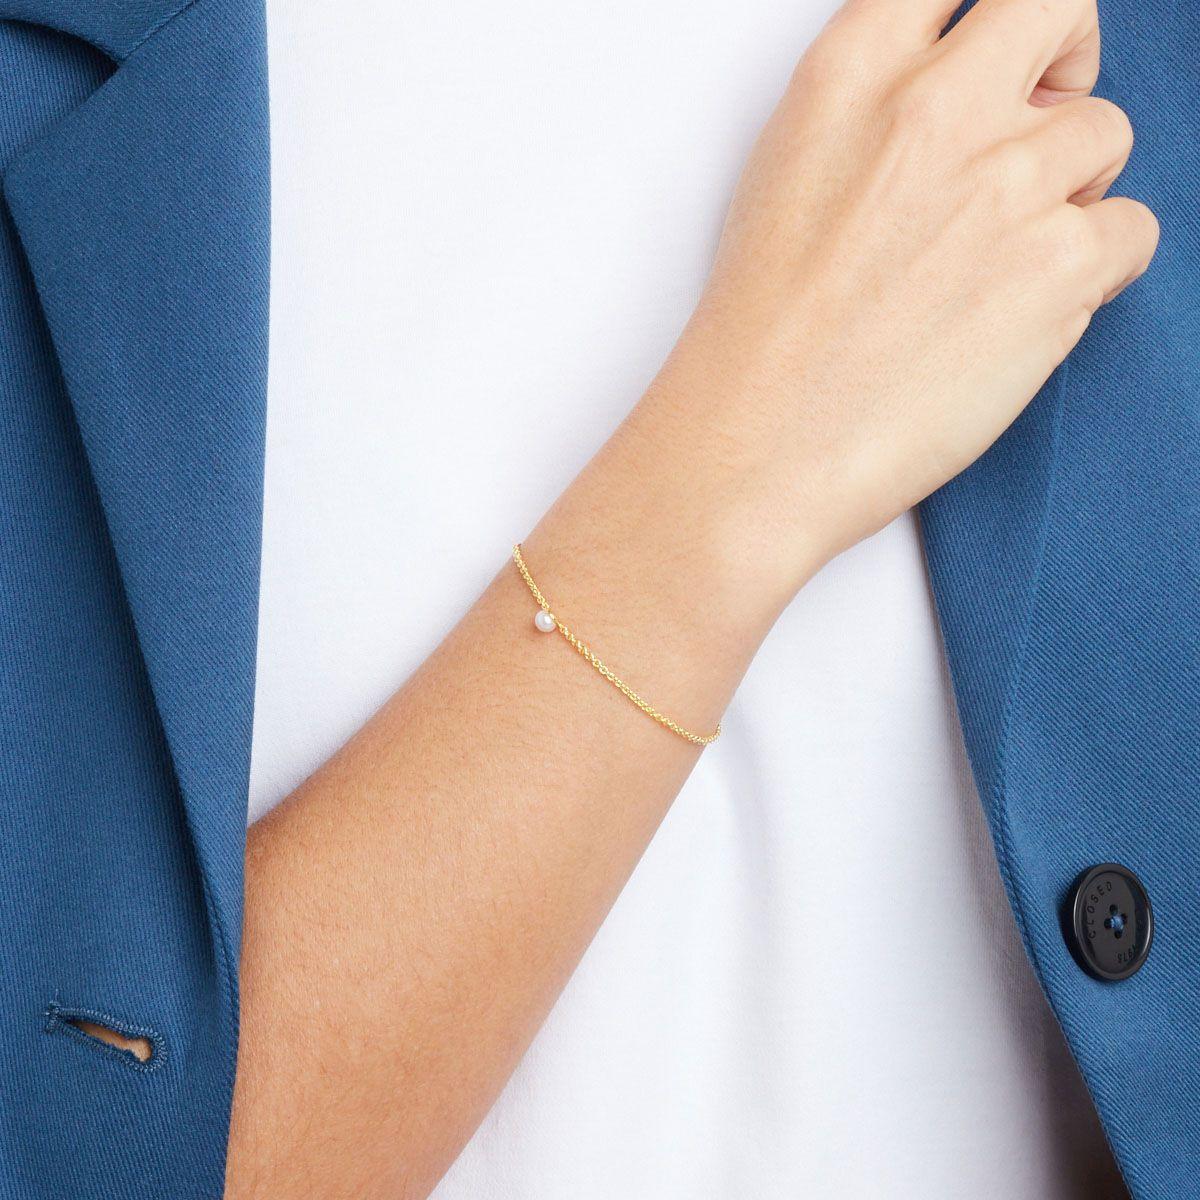 Rika - Perlenarmband - 14k vergoldet